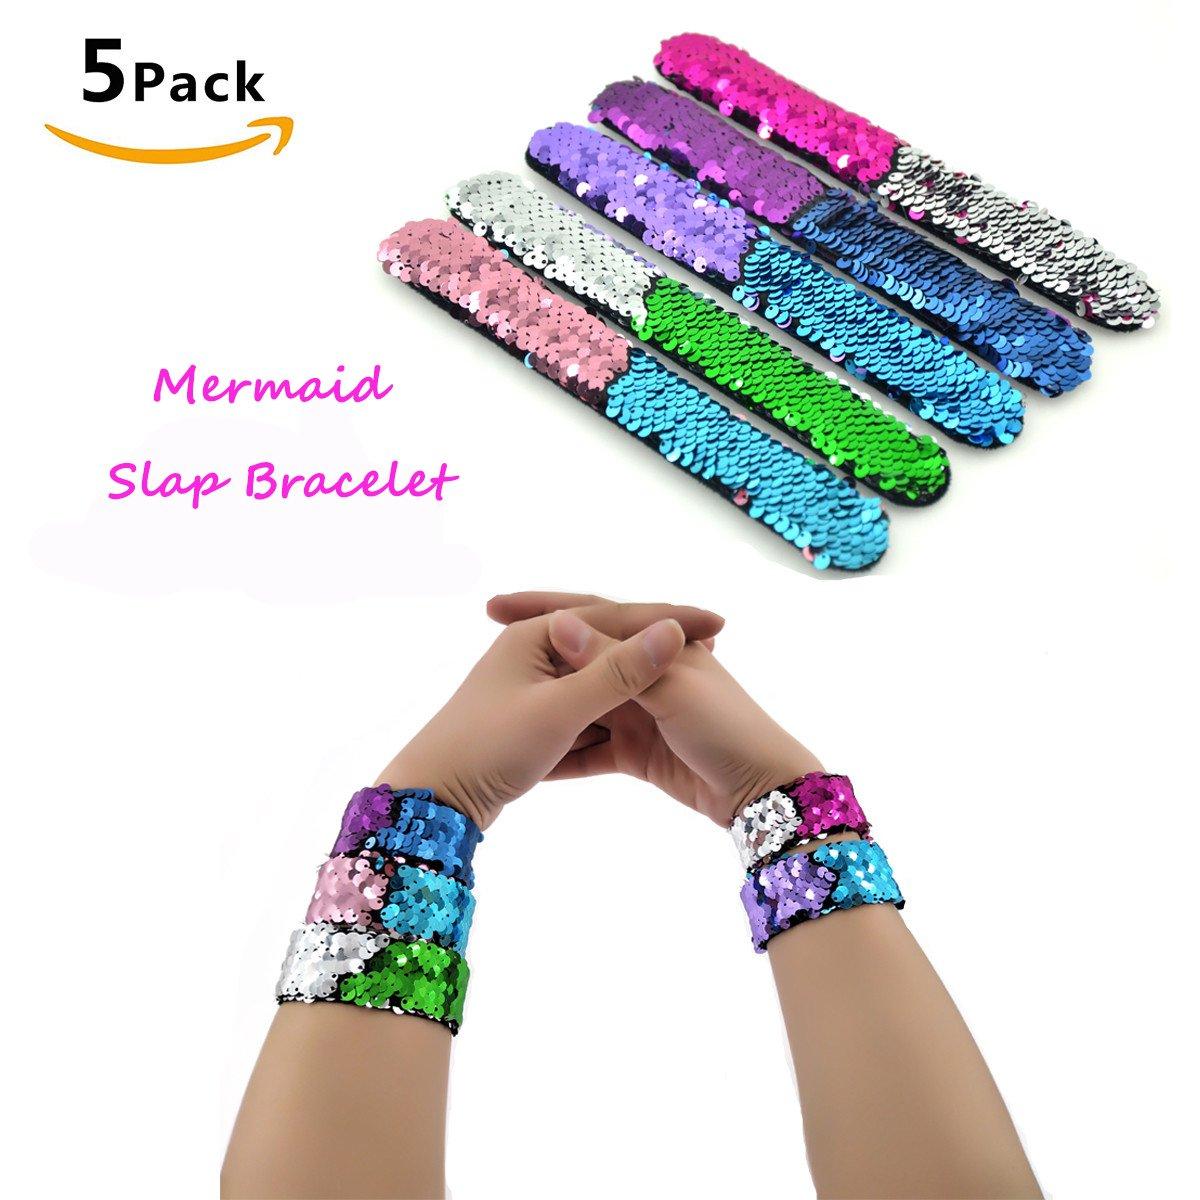 Mermaid Slap Band 8513 Bracelet Bracelets Snap Bracelet Kids Fun Coloré